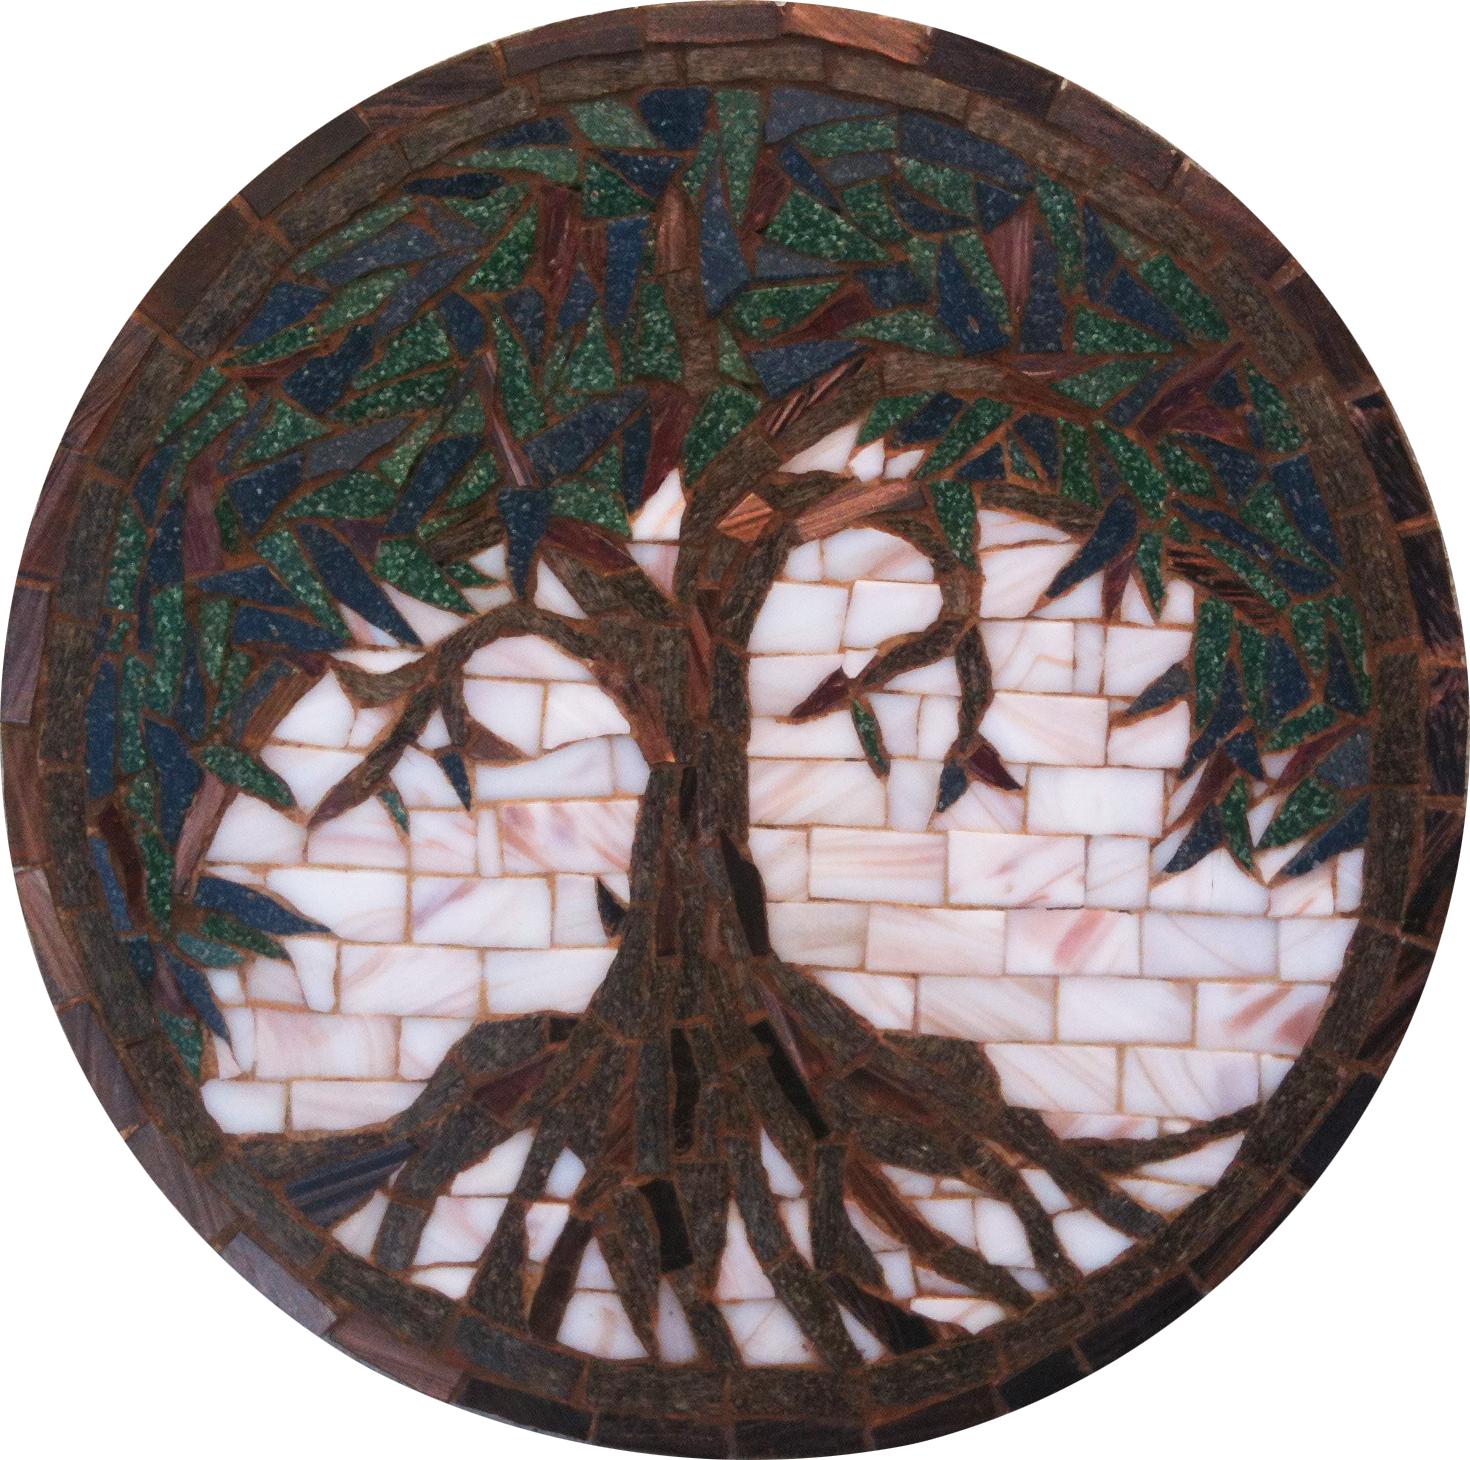 Mini Tree of Life Mosaic